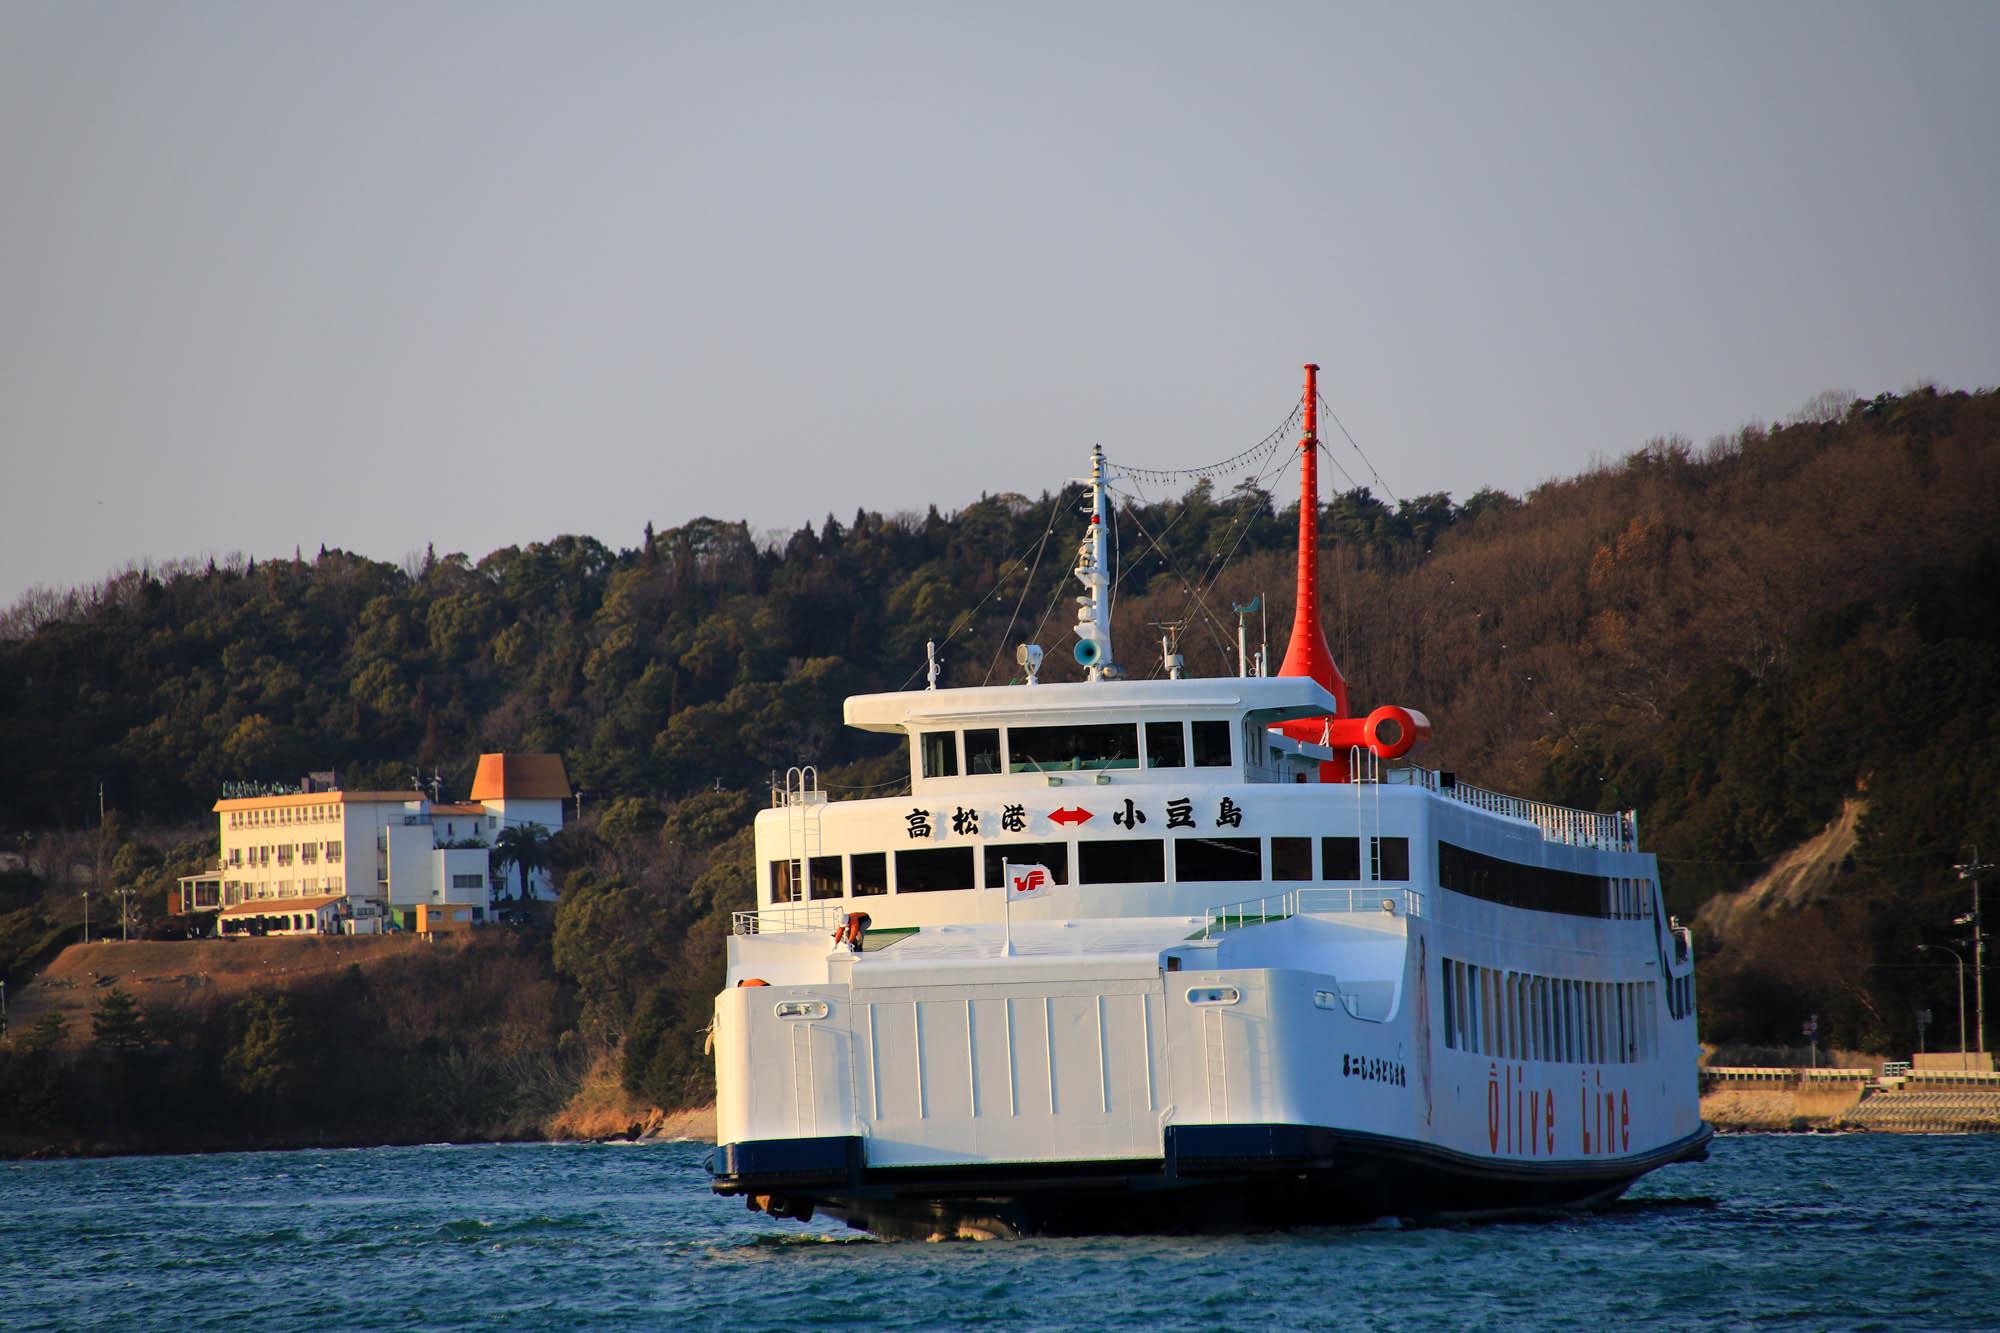 takagisan_ferry-3.jpg